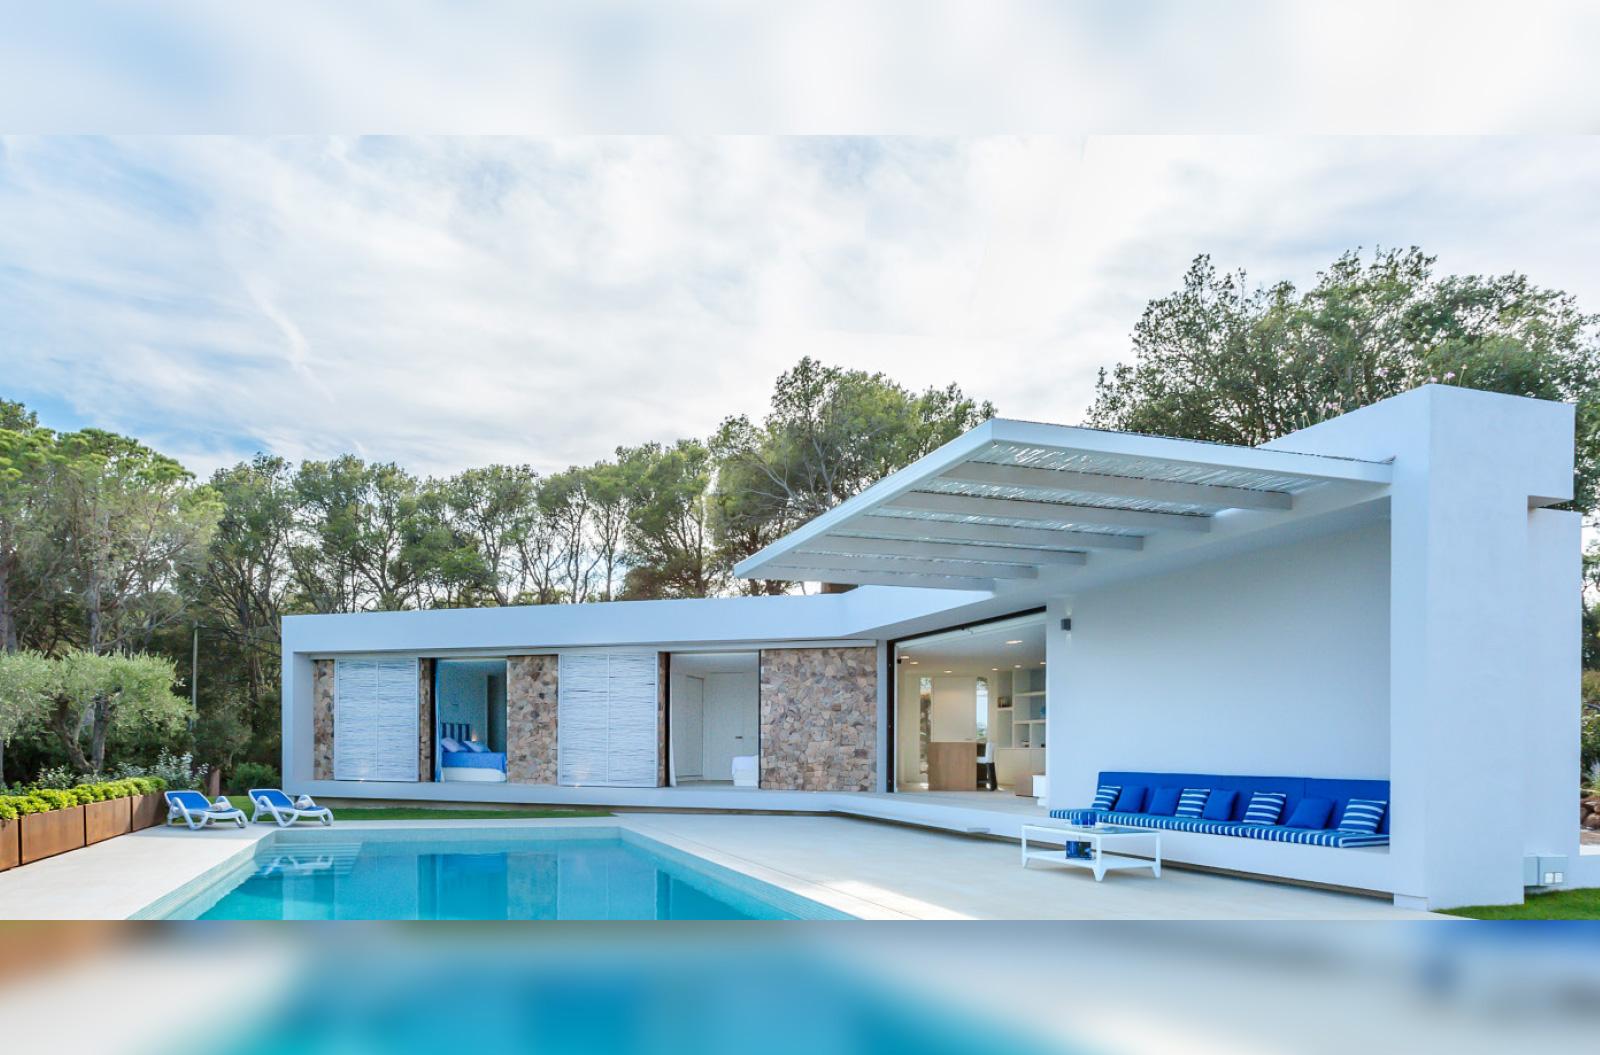 La arquitectura moderna mediterr nea es la filosof a de for Moderna architettura mediterranea